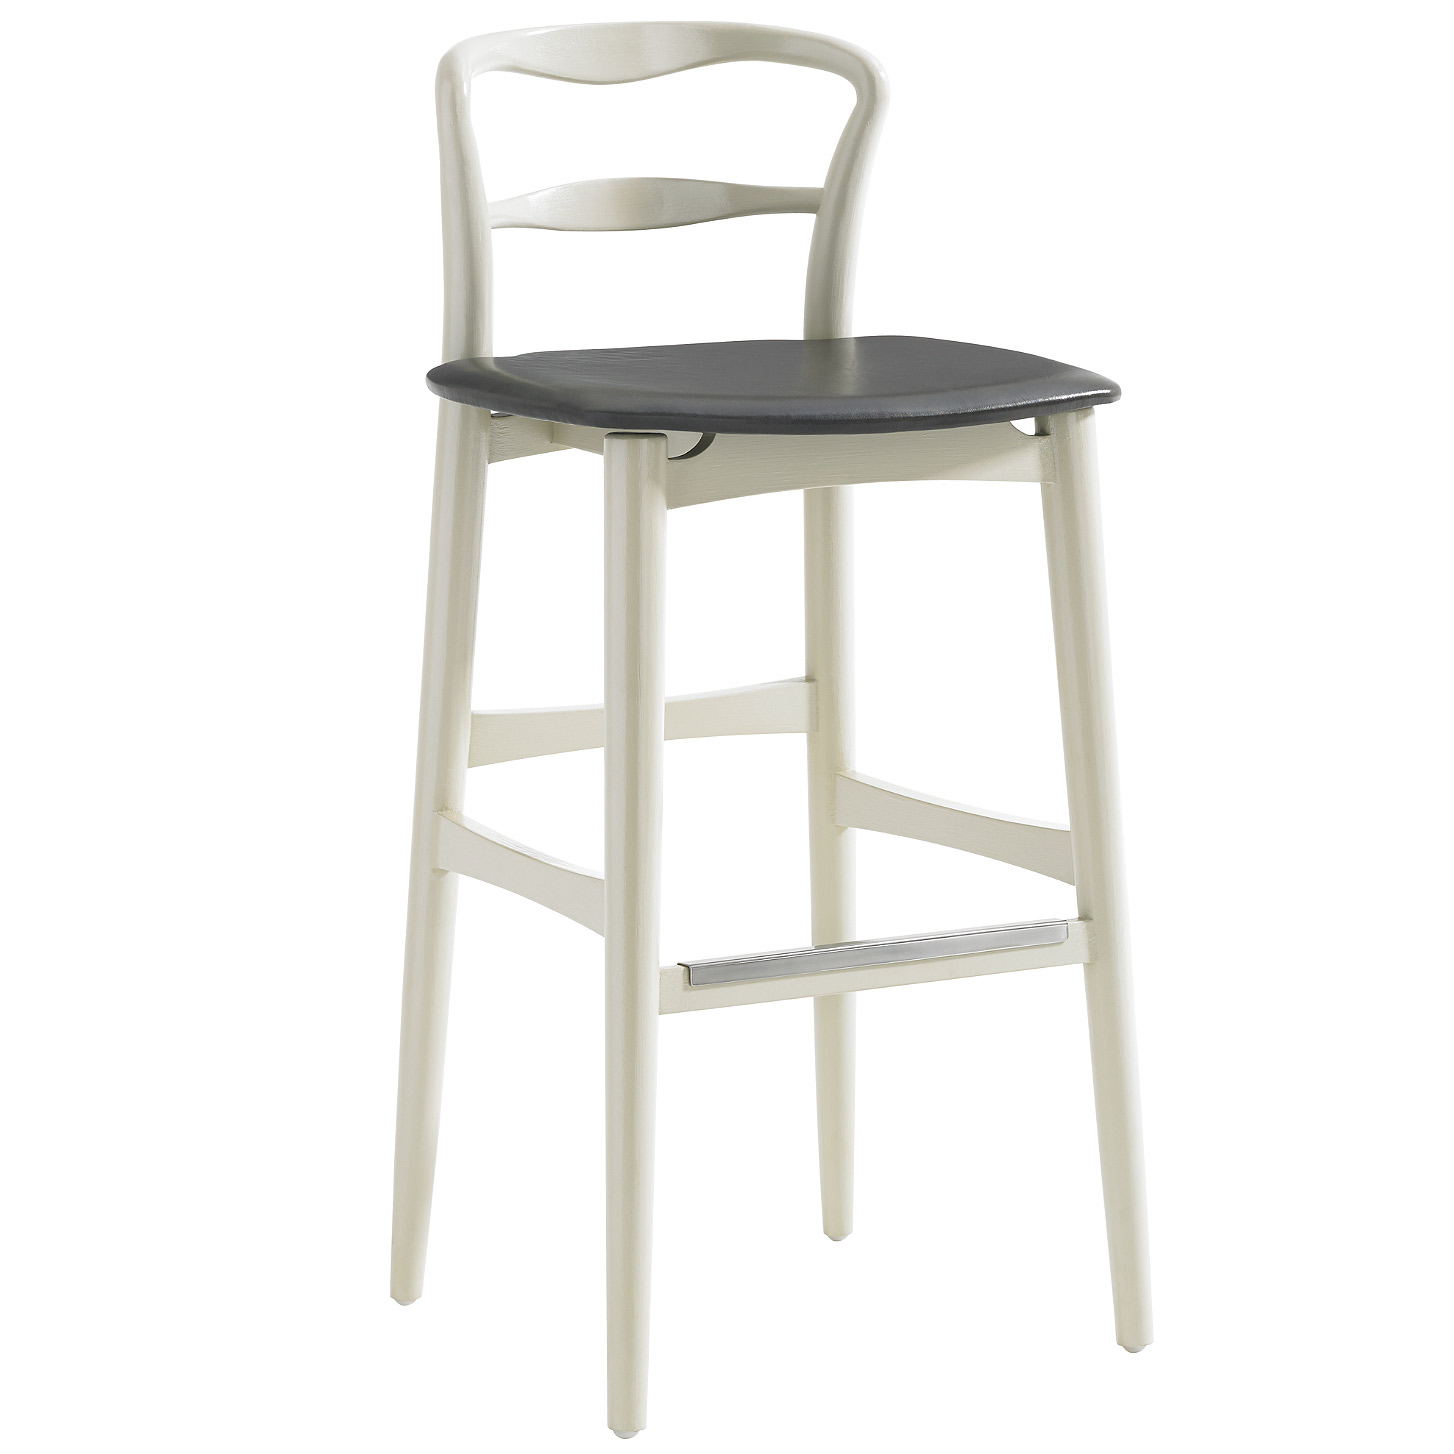 77+ Stanley Furniture Bar Stools   Diy Modern Furniture Check More At Http:/